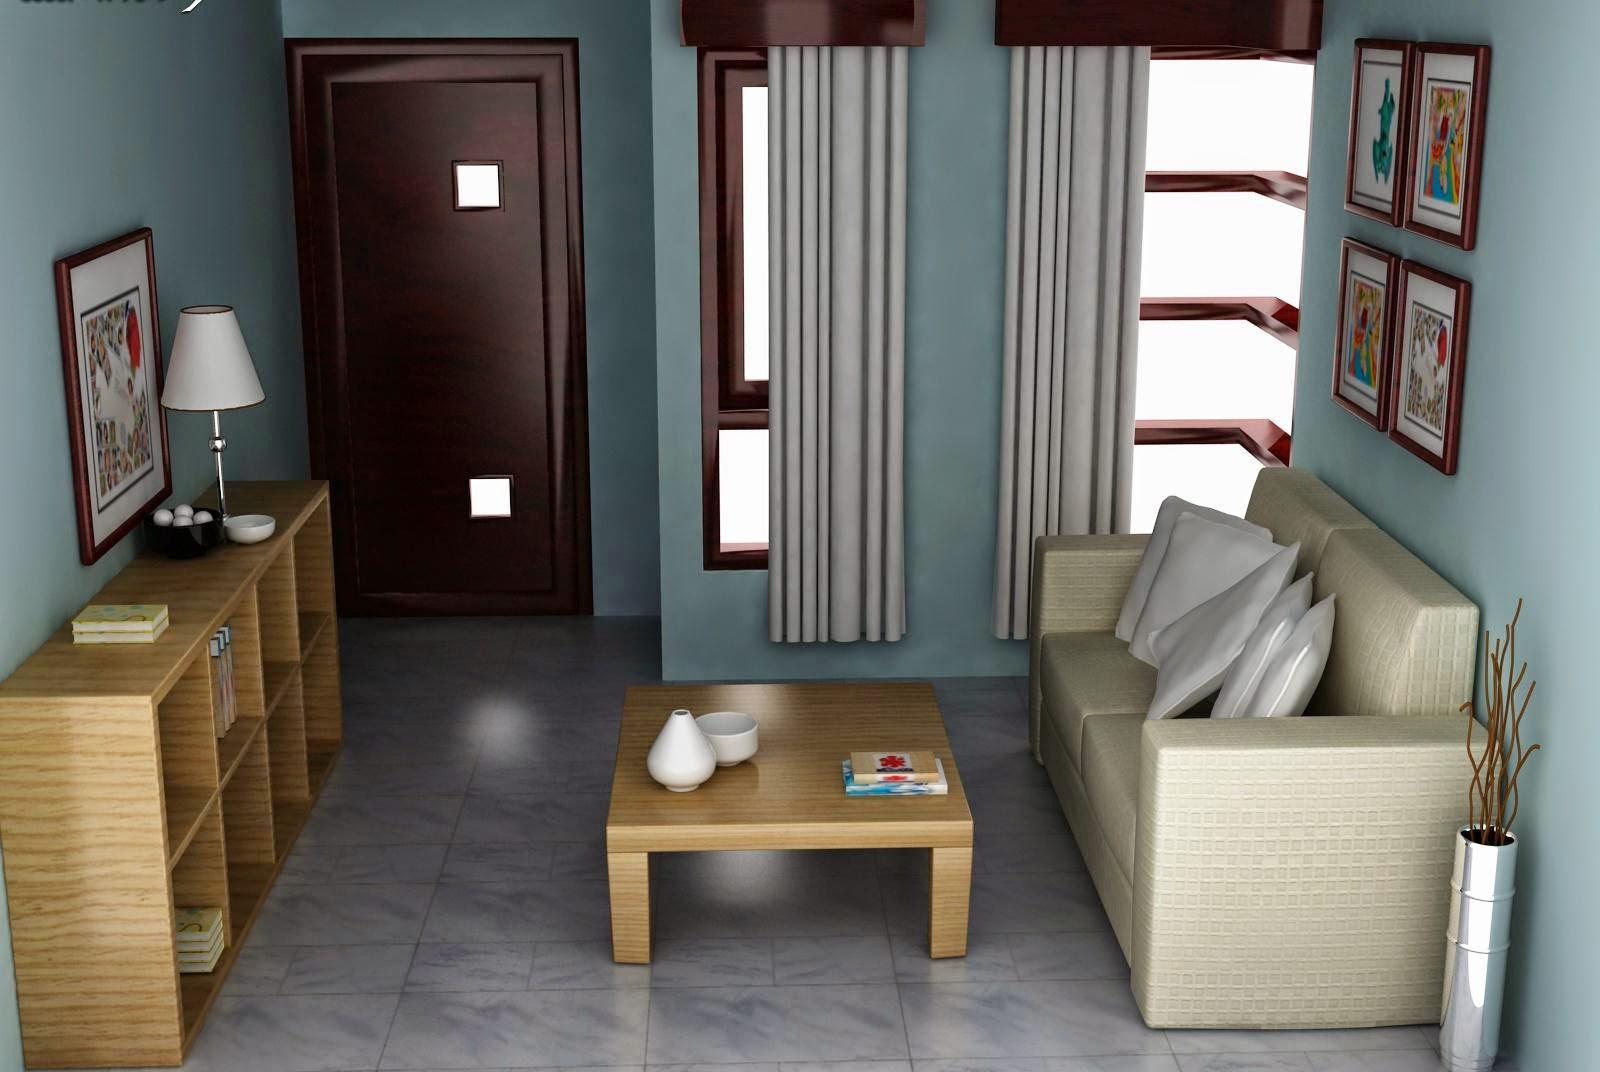 Gambar Design Model Ruang Tamu Rumah Mungil Minimalis ...